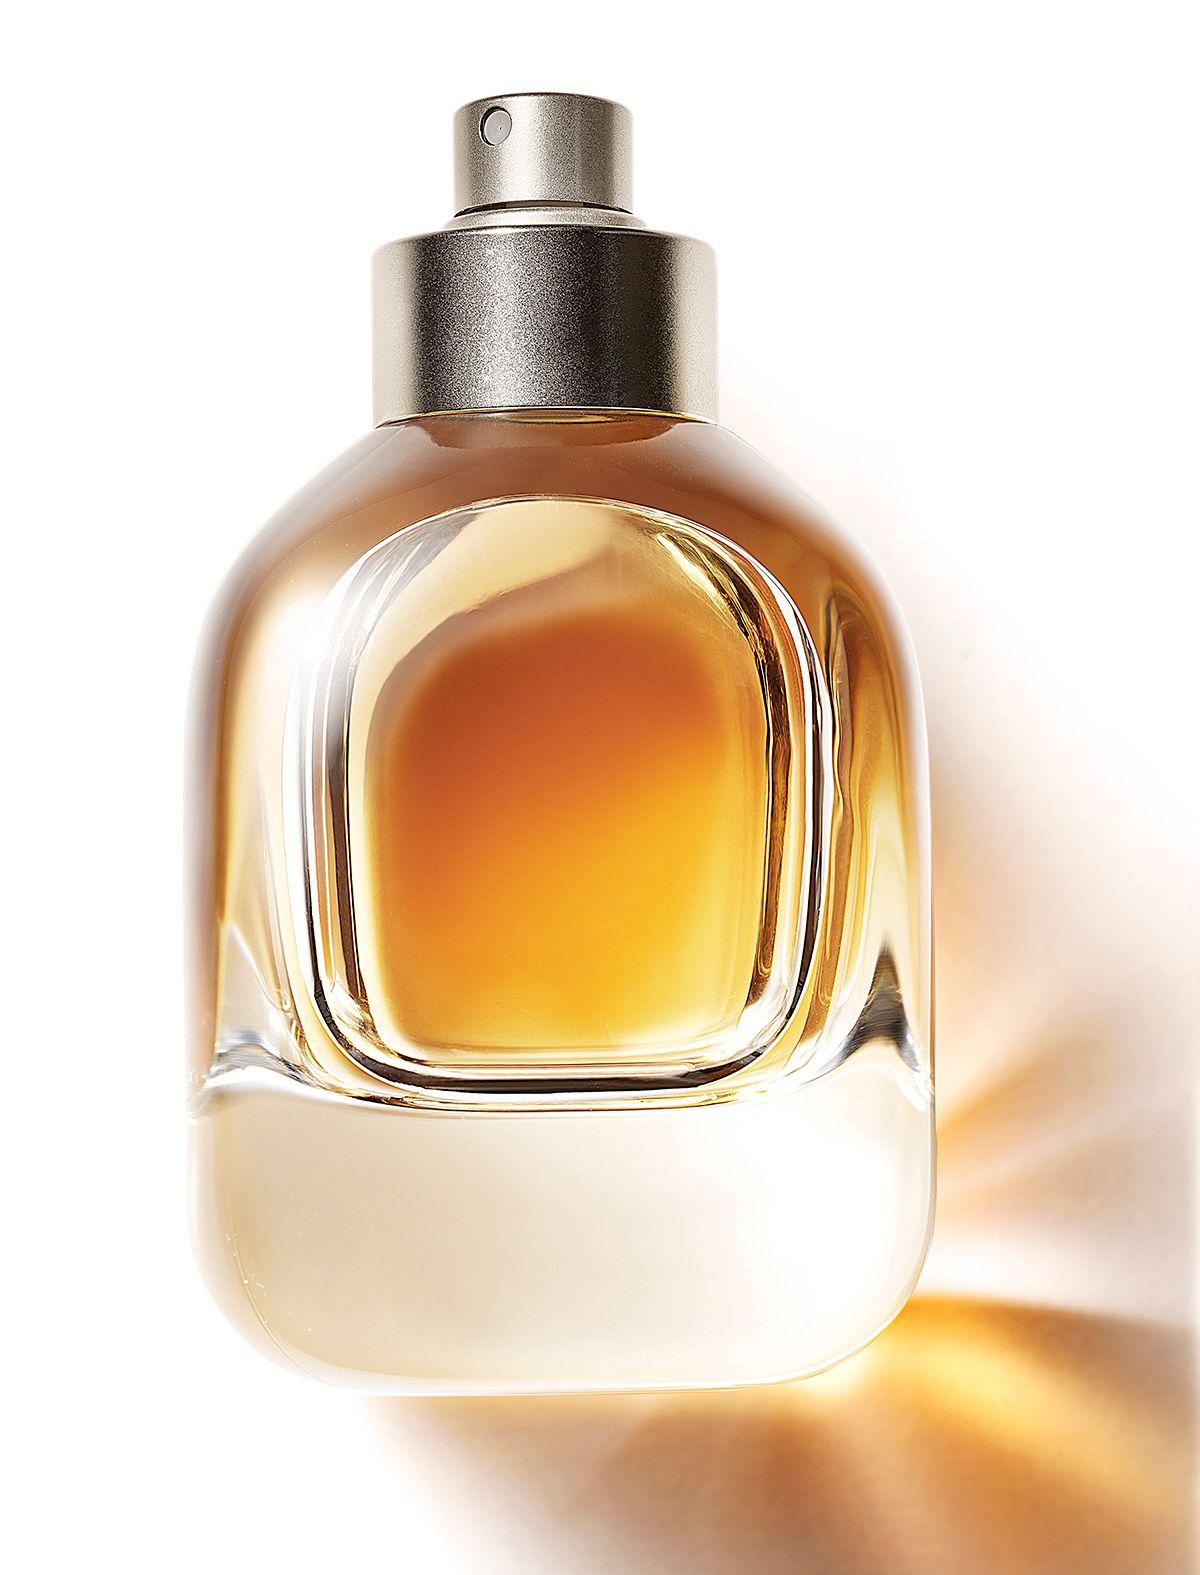 fragrance_july19_01_4x6.jpg